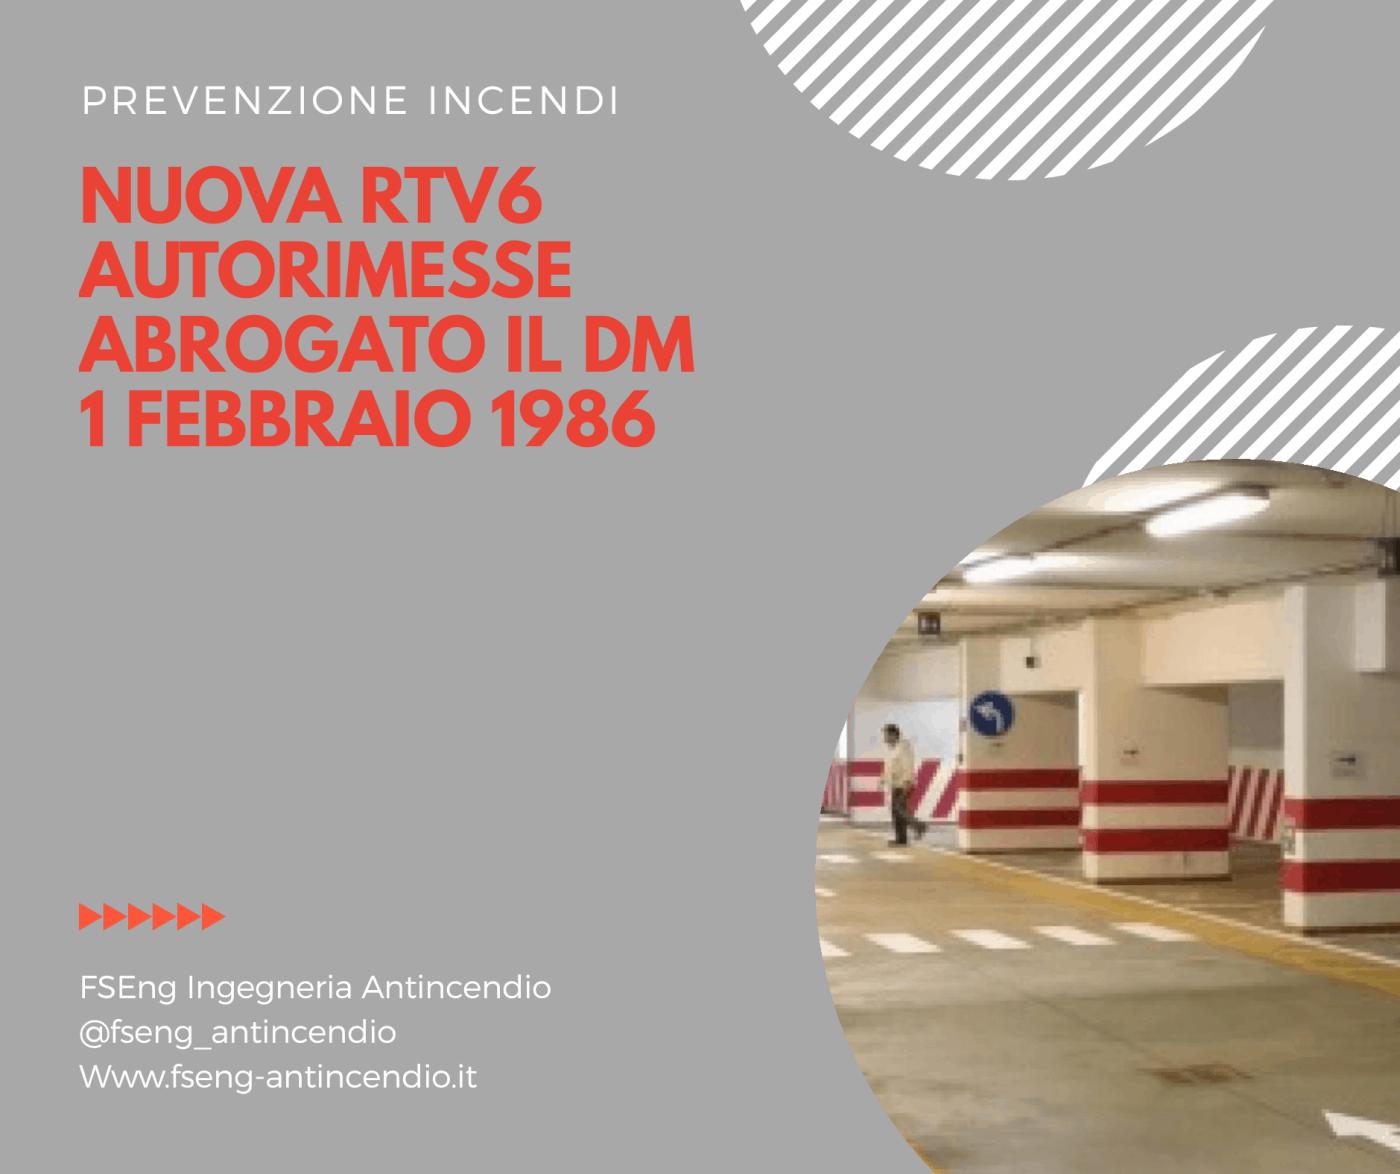 nuova rtv6 autorimesse abrogato dm 1 febbraio 1986